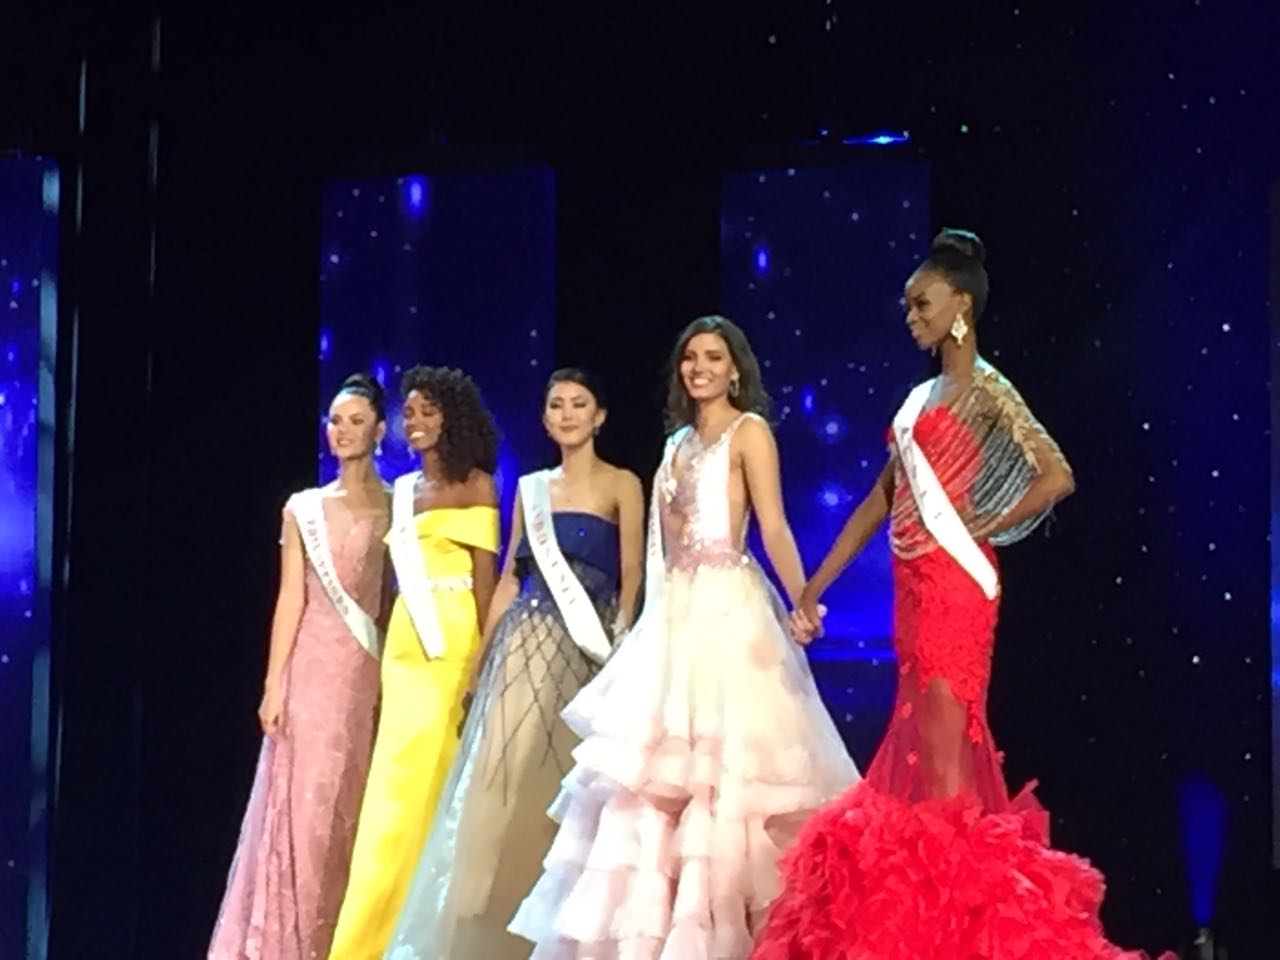 https: img.okezone.com content 2016 12 24 194 1574862 top-fashion-2-jawaban-ini-hantarkan-natasha-mannuela-raih-predikat-juara-3-miss-world-2016-AwIQ8VlOYw.jpg